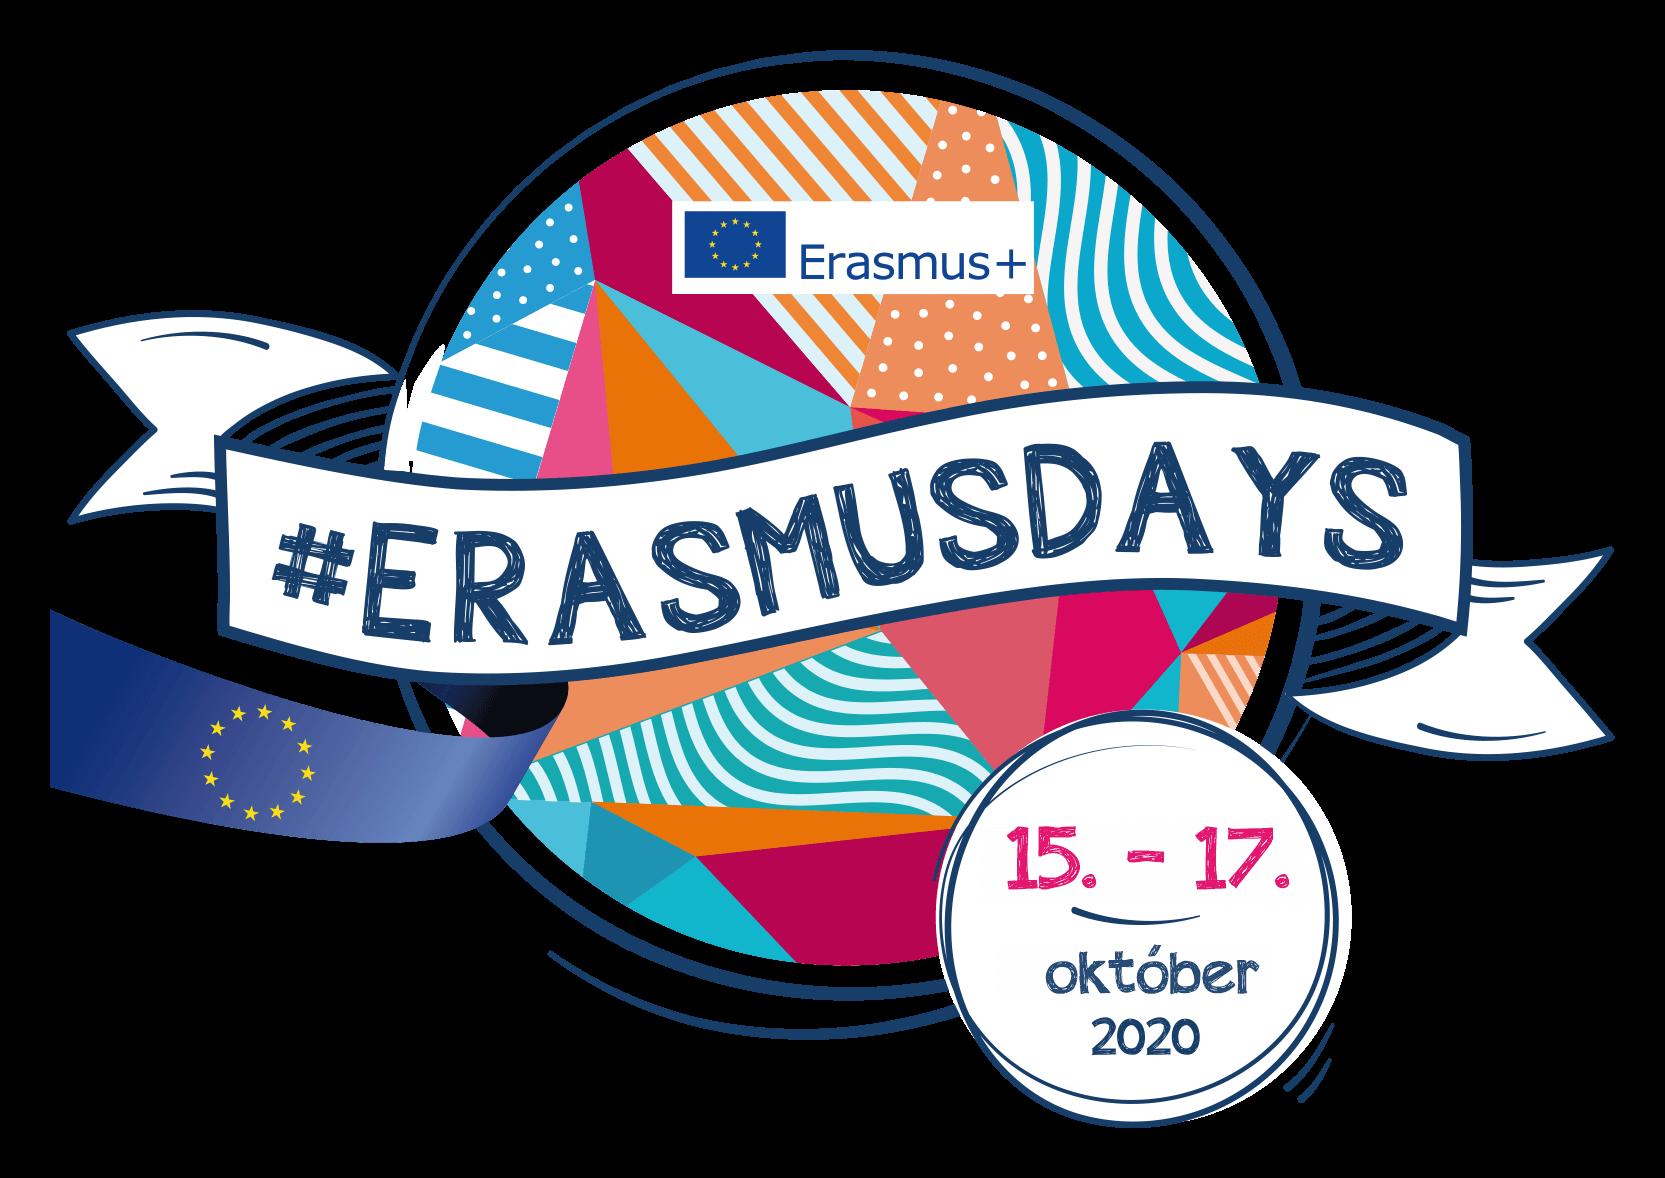 ErasmusDays_biele